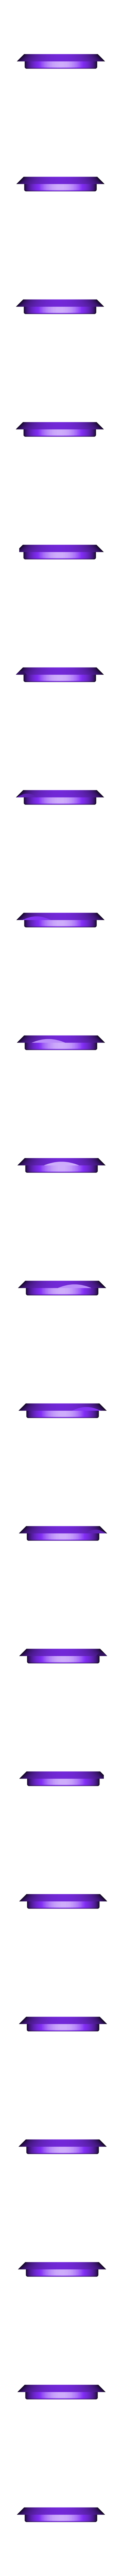 LED_BLADE_CAP.stl Download free STL file LED BLADE • Design to 3D print, MuSSy